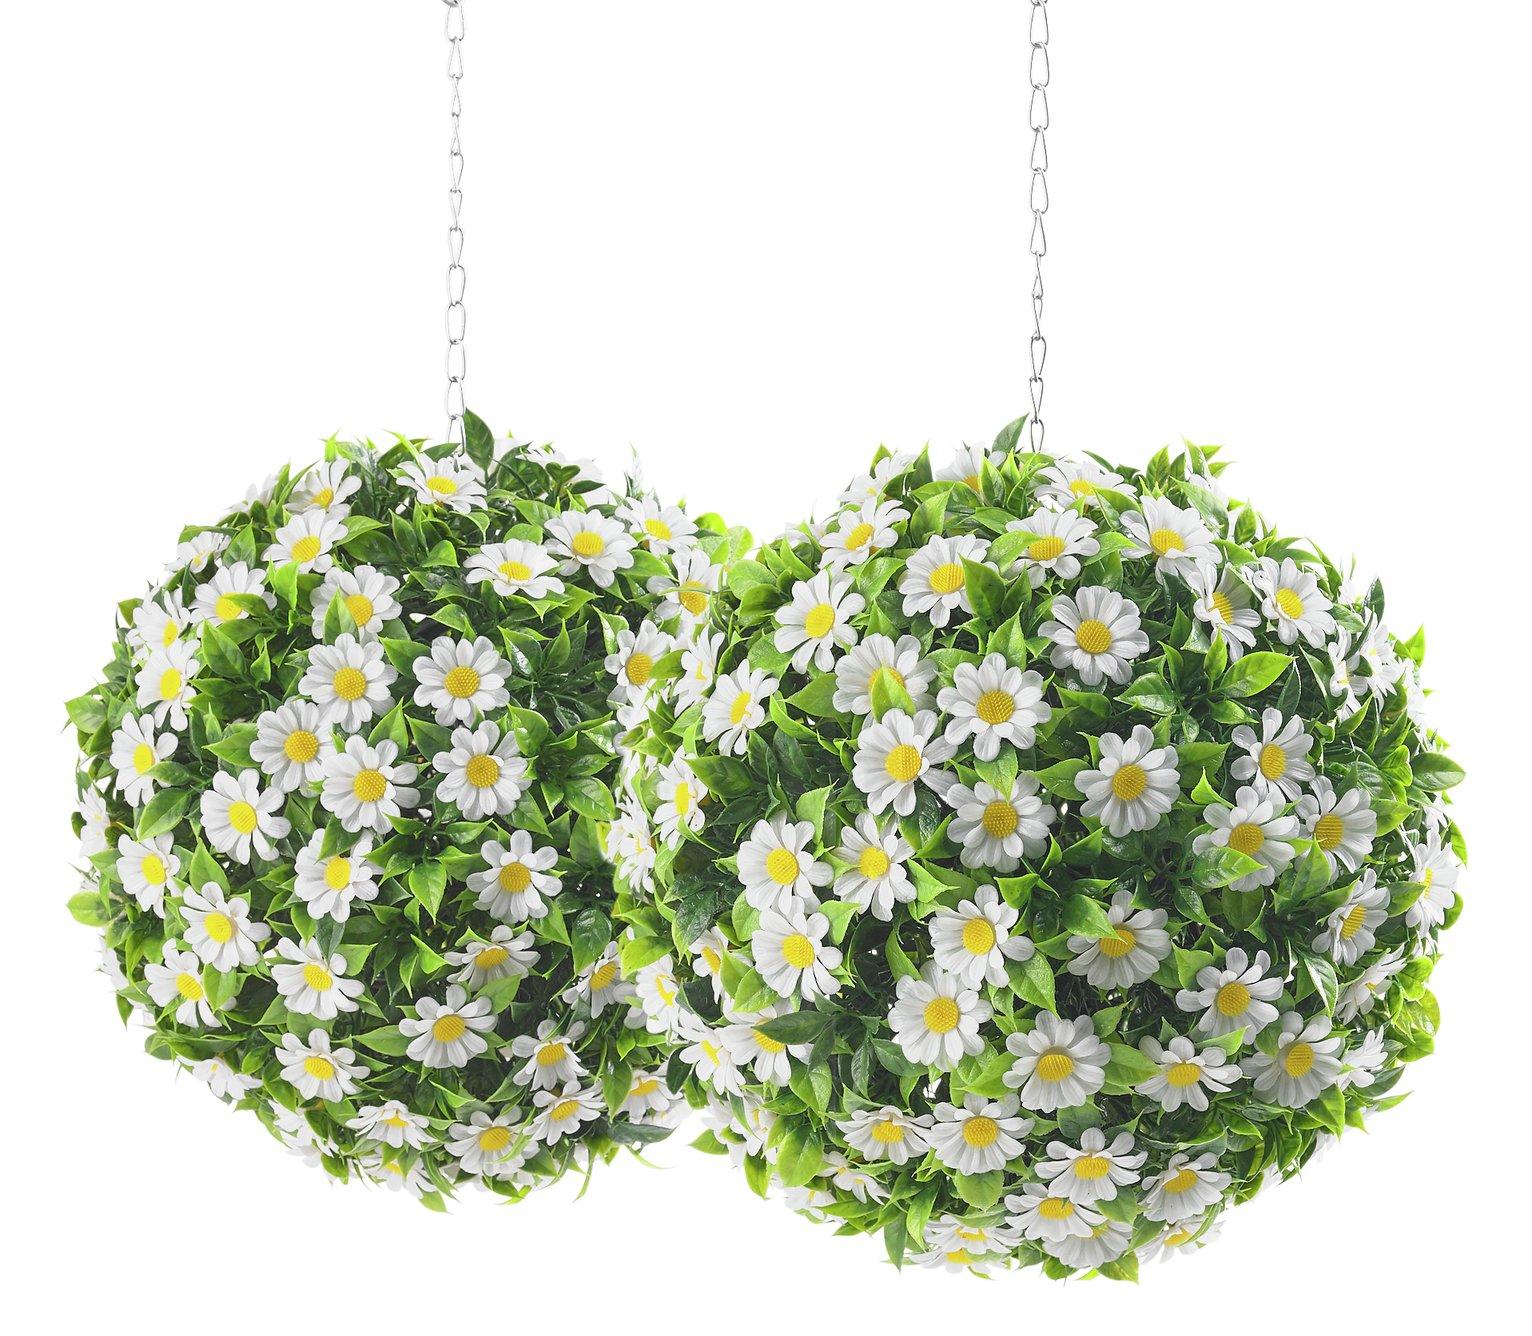 daisy-x2-art-topiary-balls-30cm